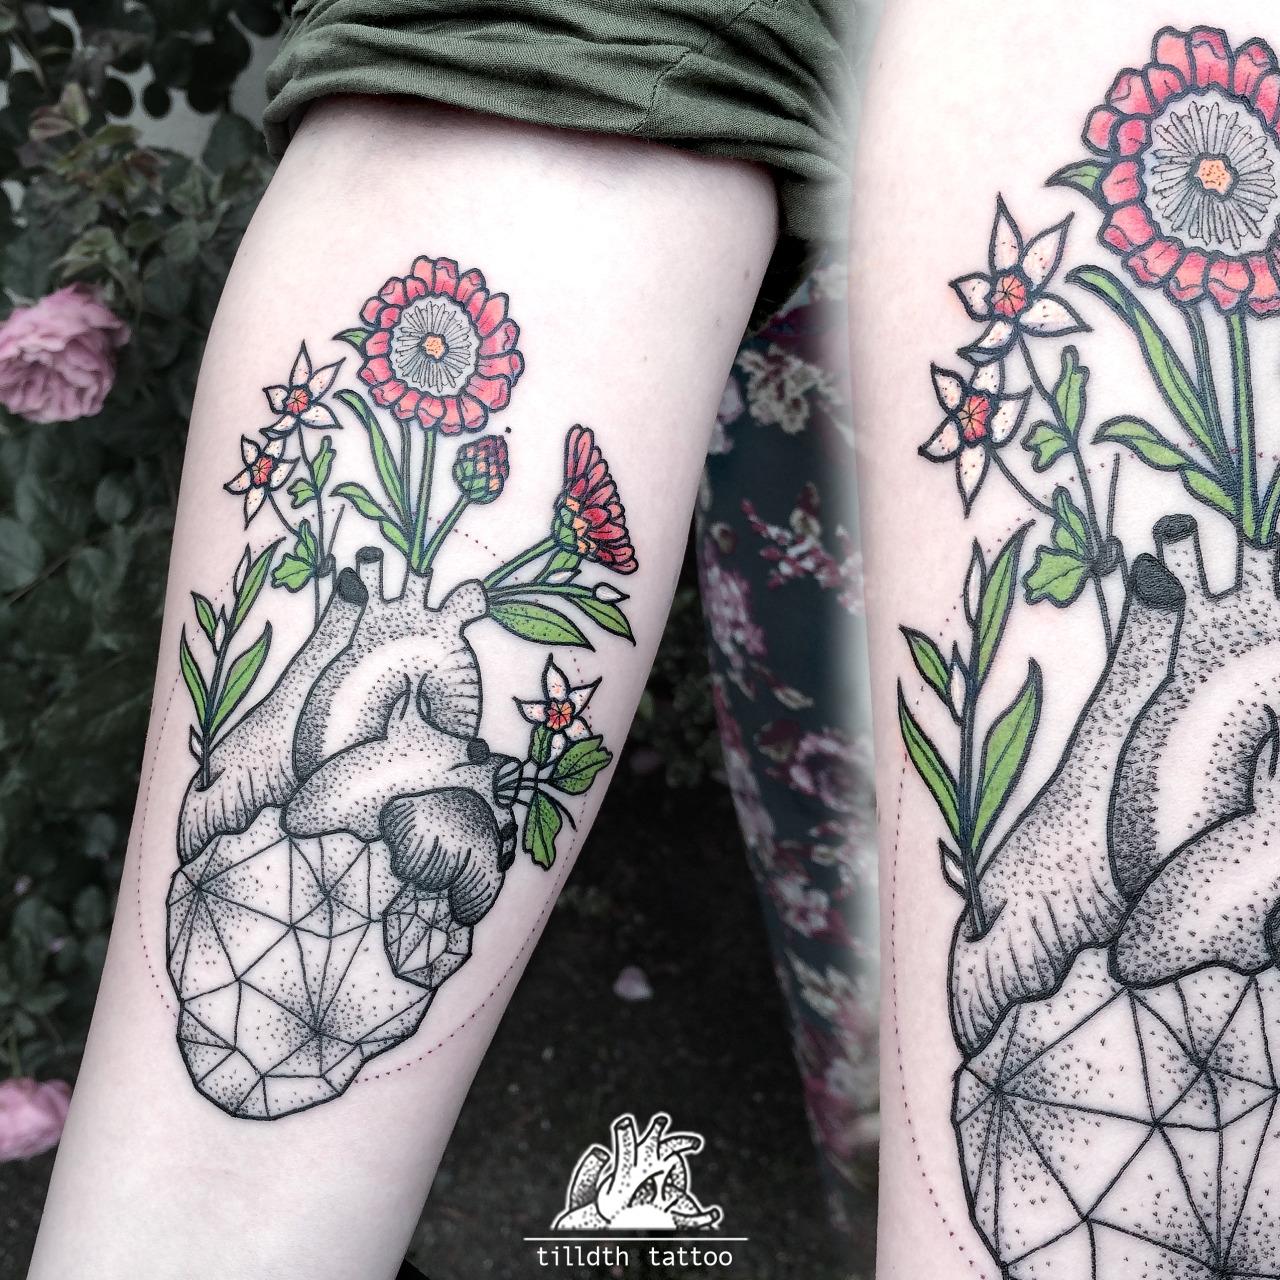 Tilldth Tattoo - the vandallist (6)